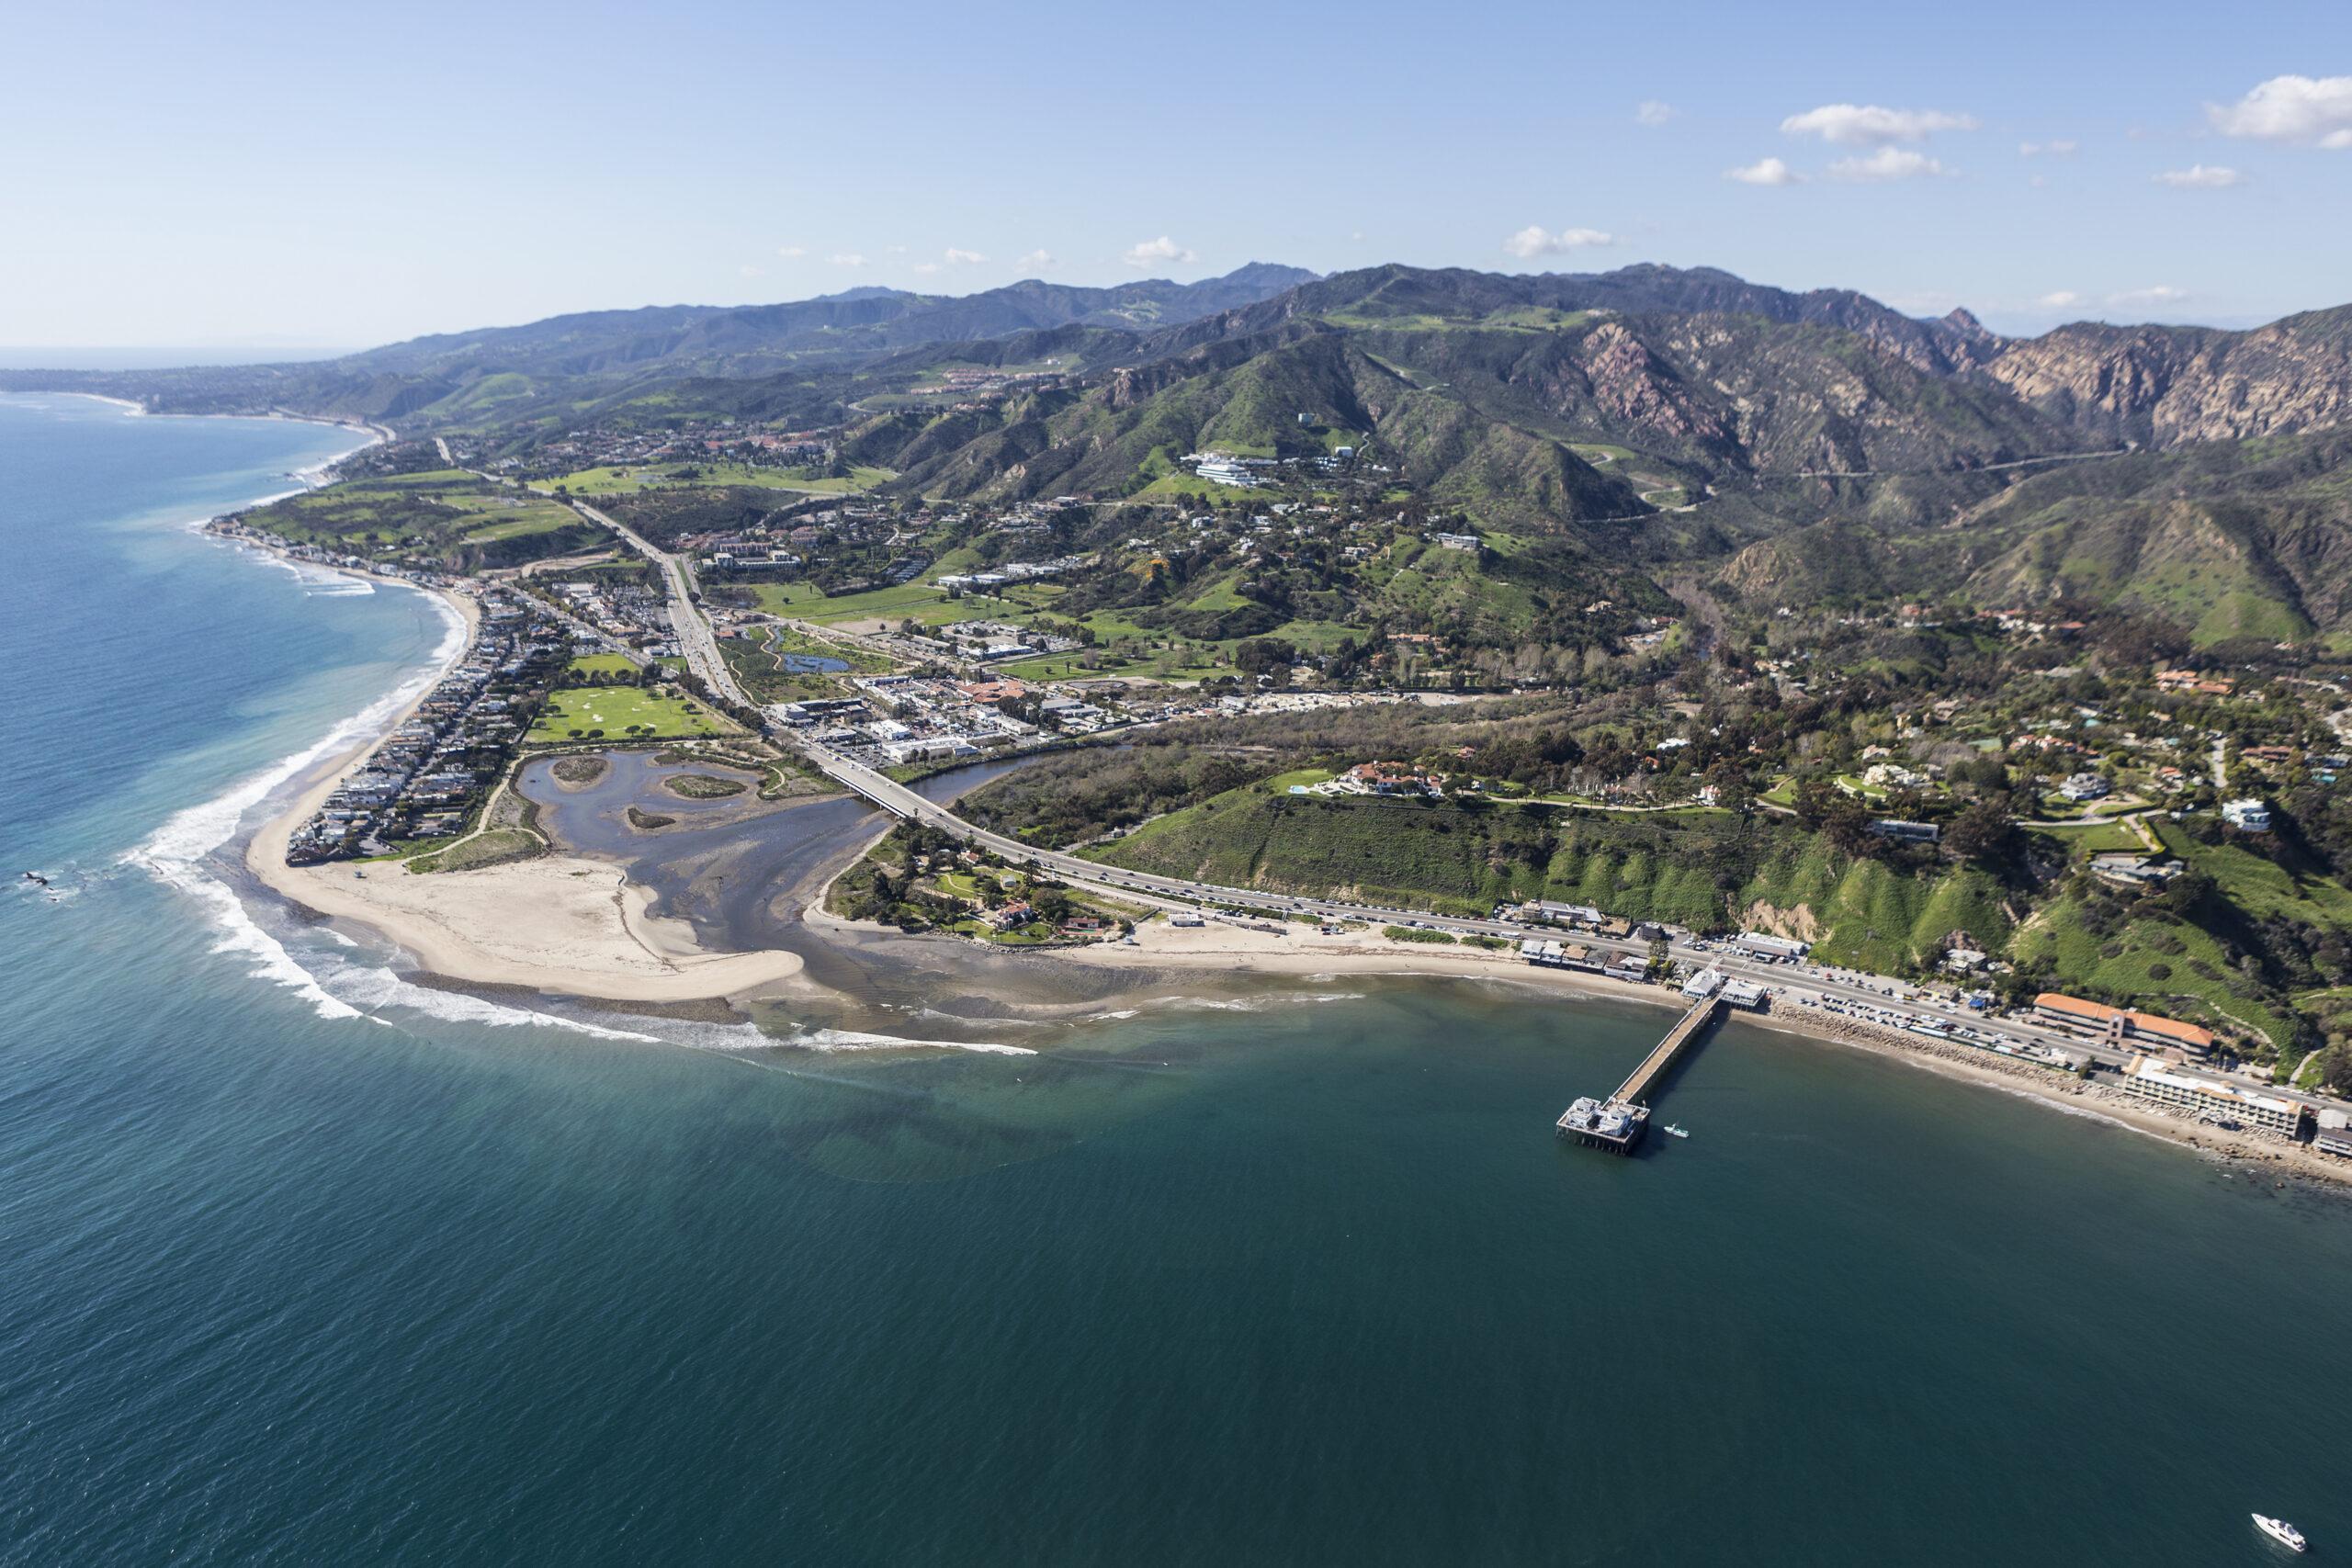 Aerial view of Malibu Pier and Surfrider Beach near Los Angeles, California.